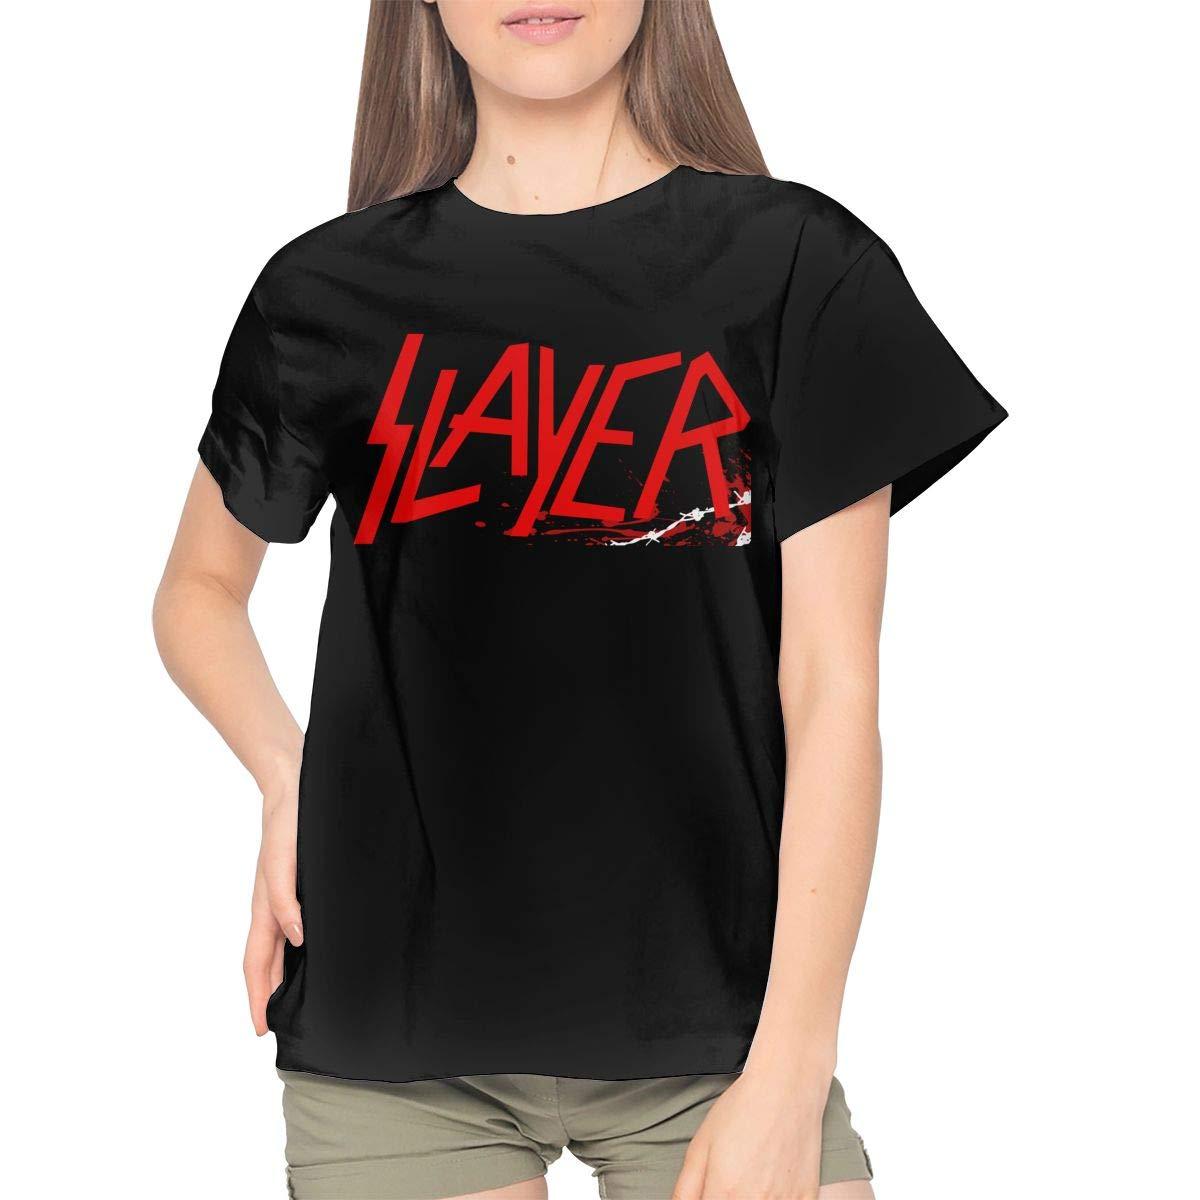 Slayer Band Womans Graphic Print Tshirt Short Sleeve Tee Top